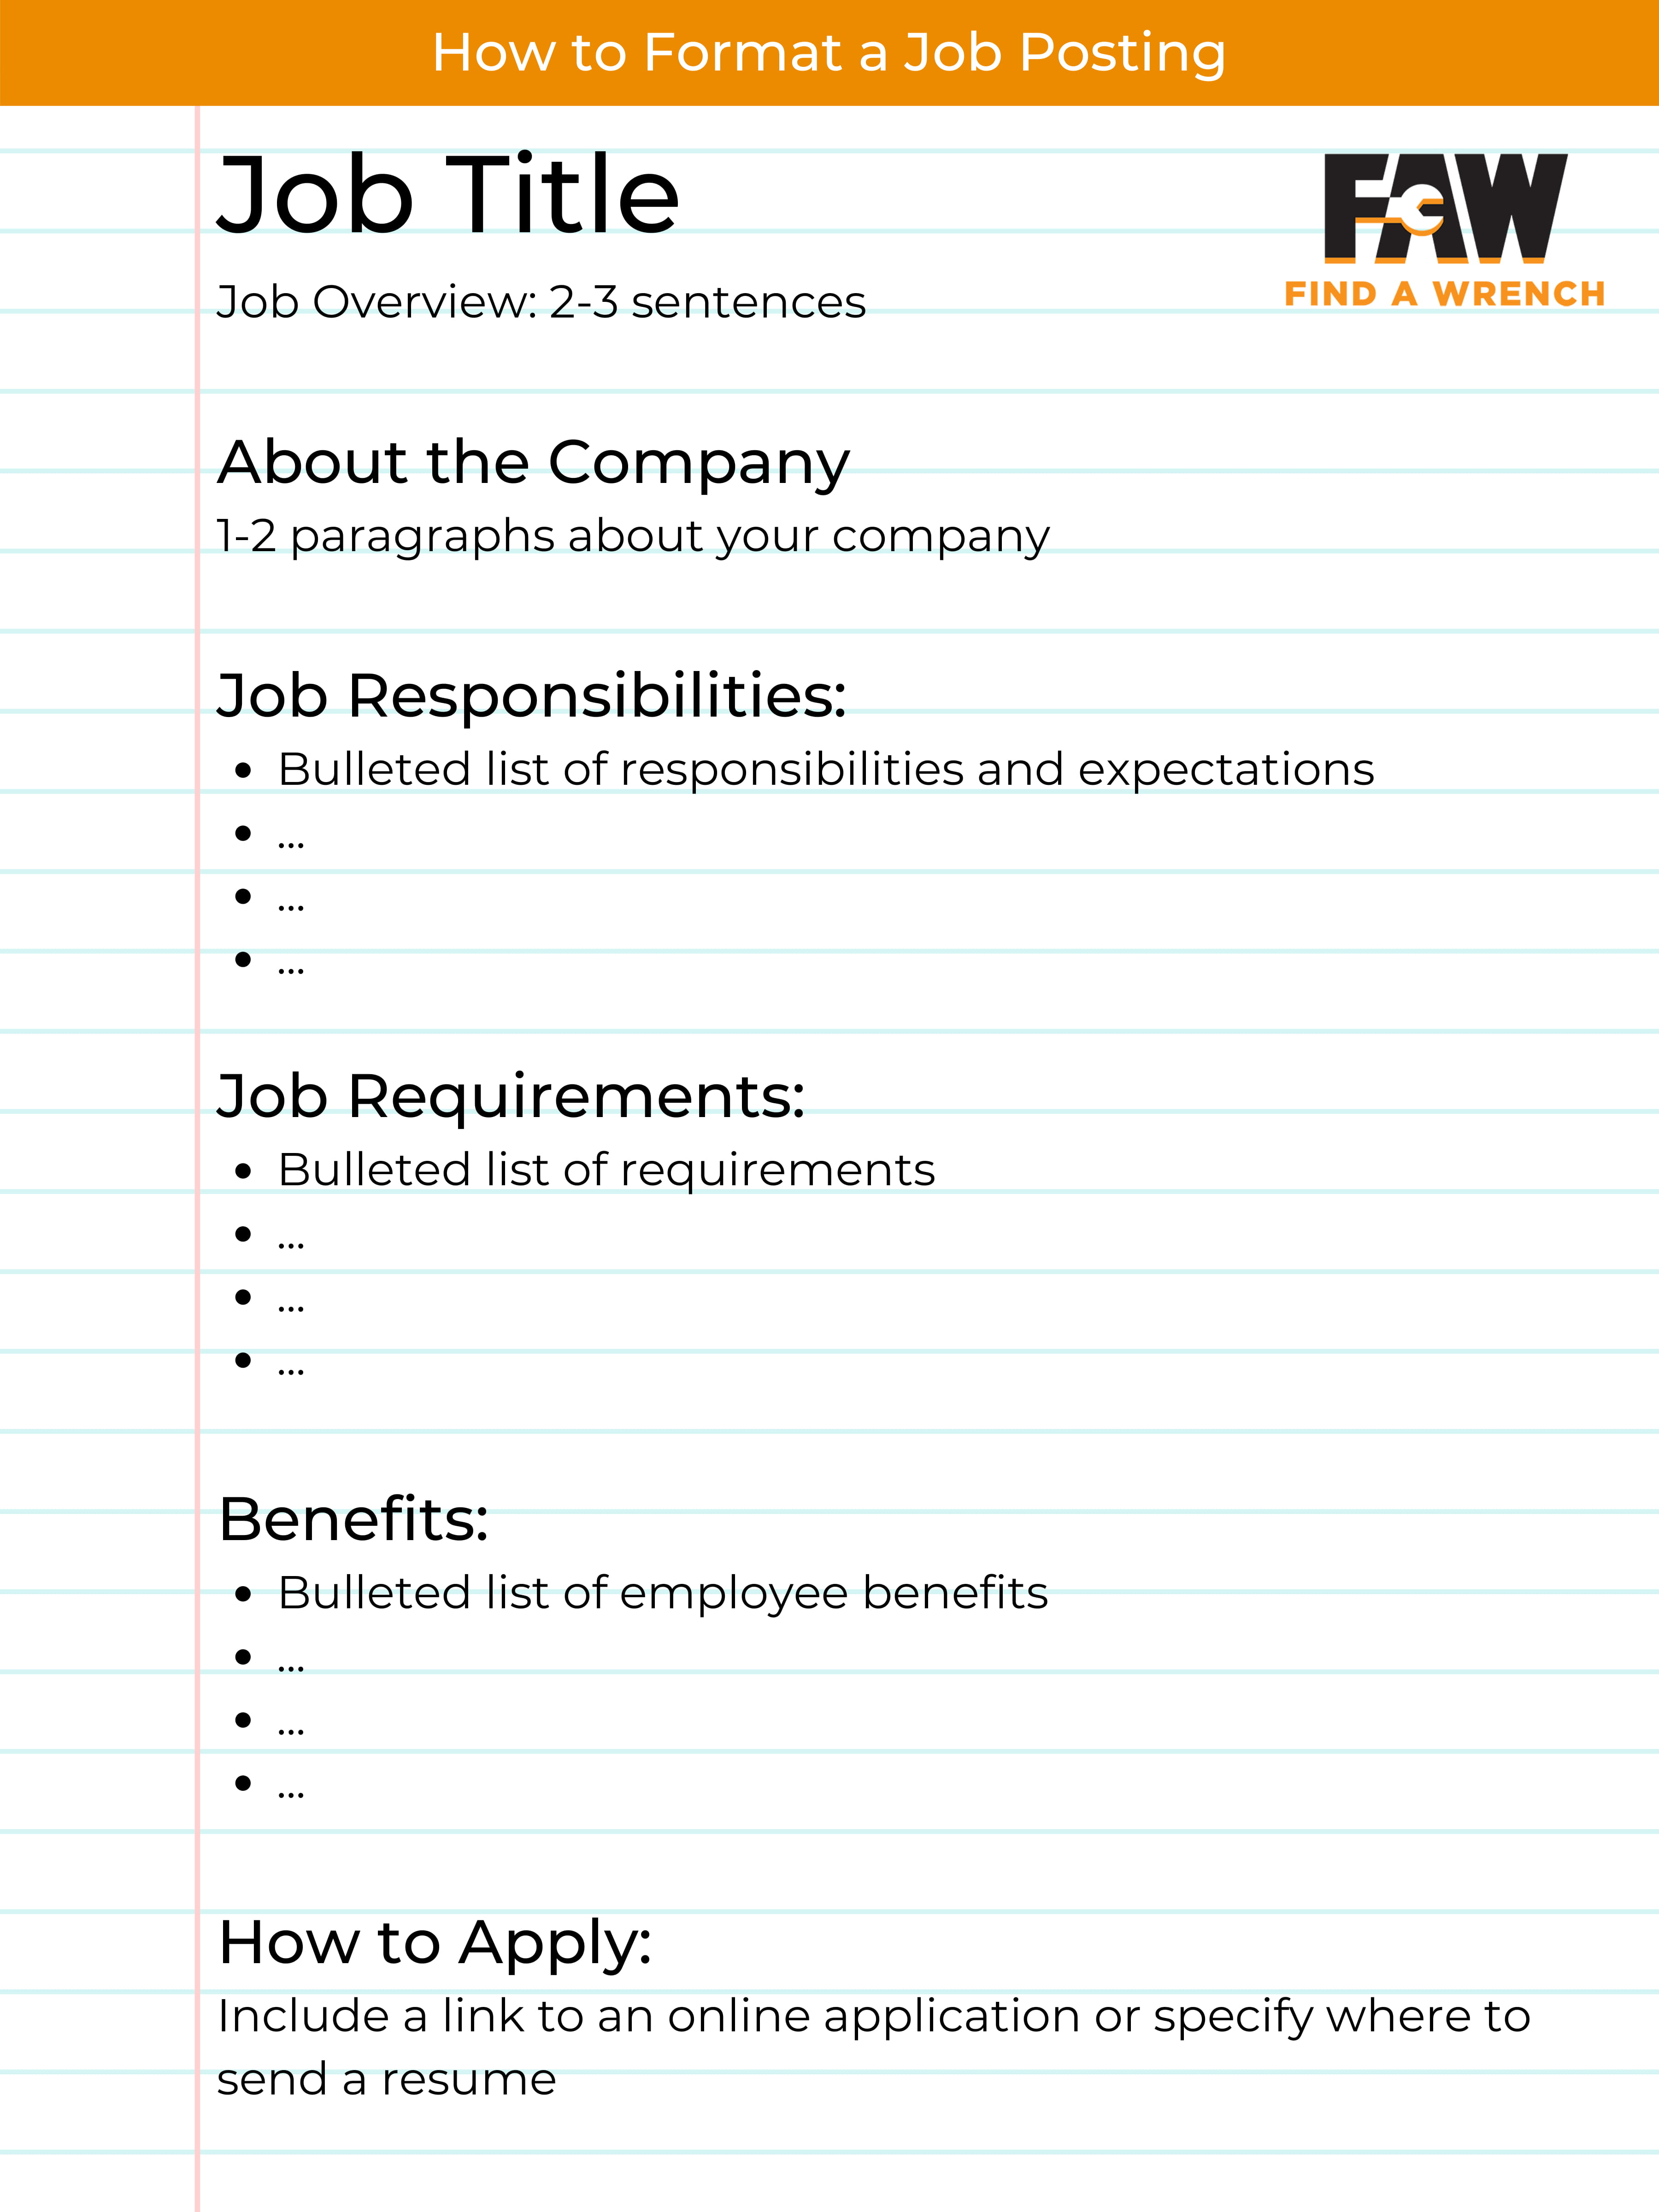 job-posting-format